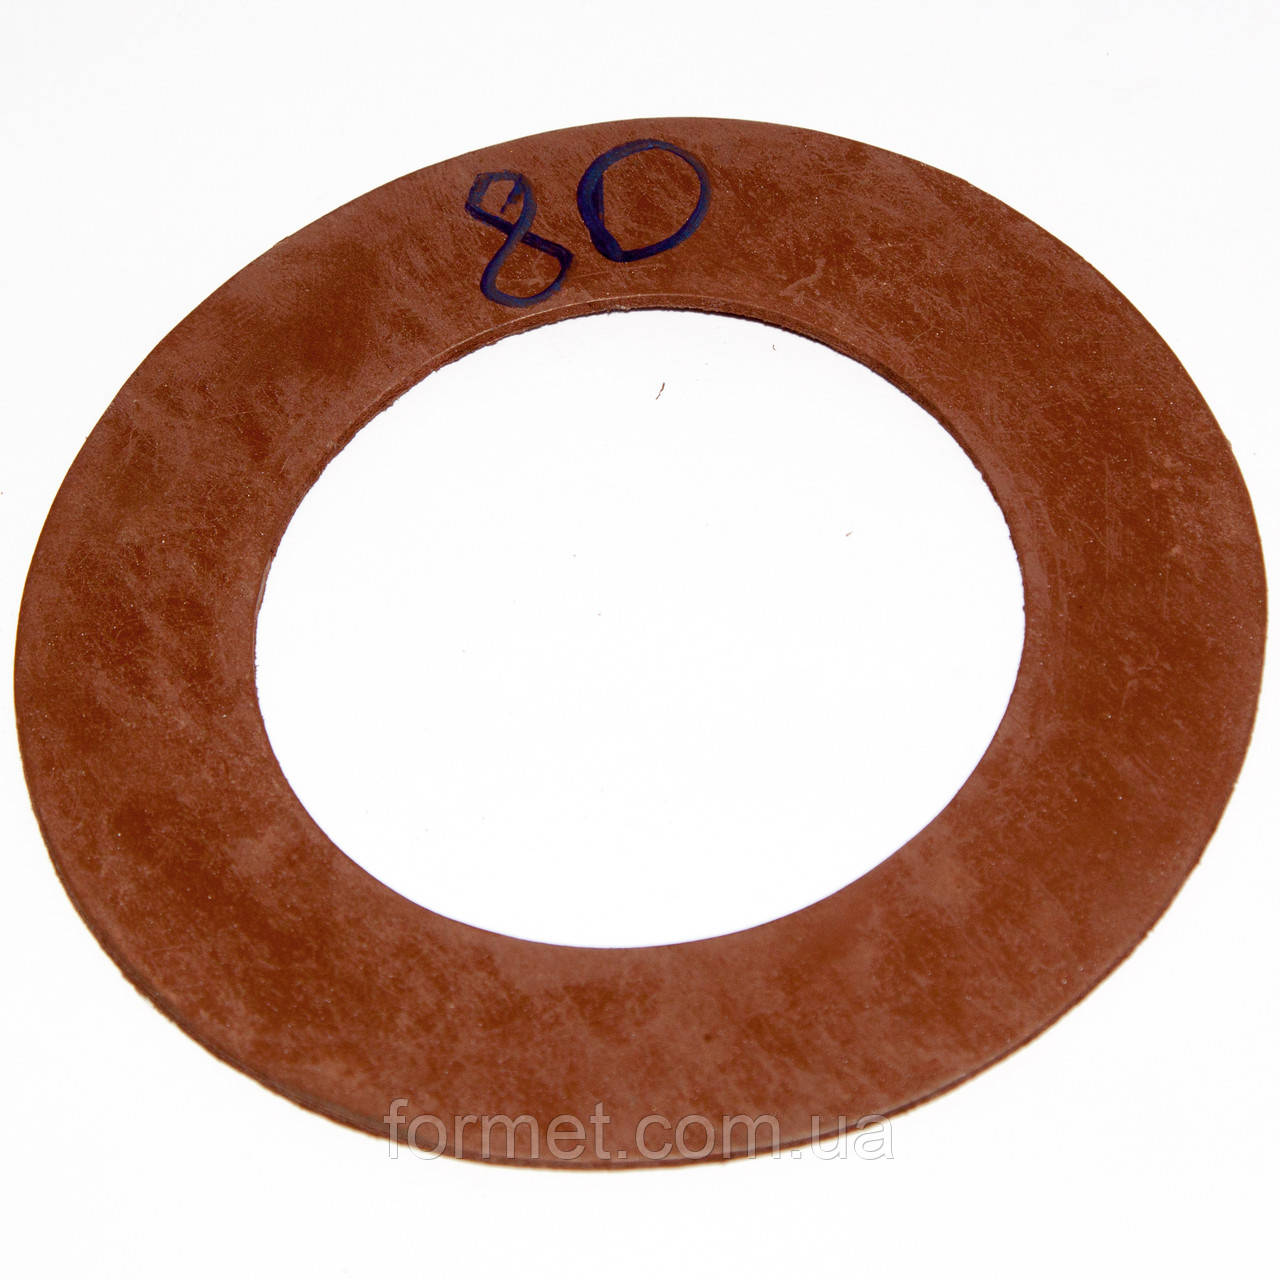 Прокладка фланцевая биконитовая  Ду 80 РУ16